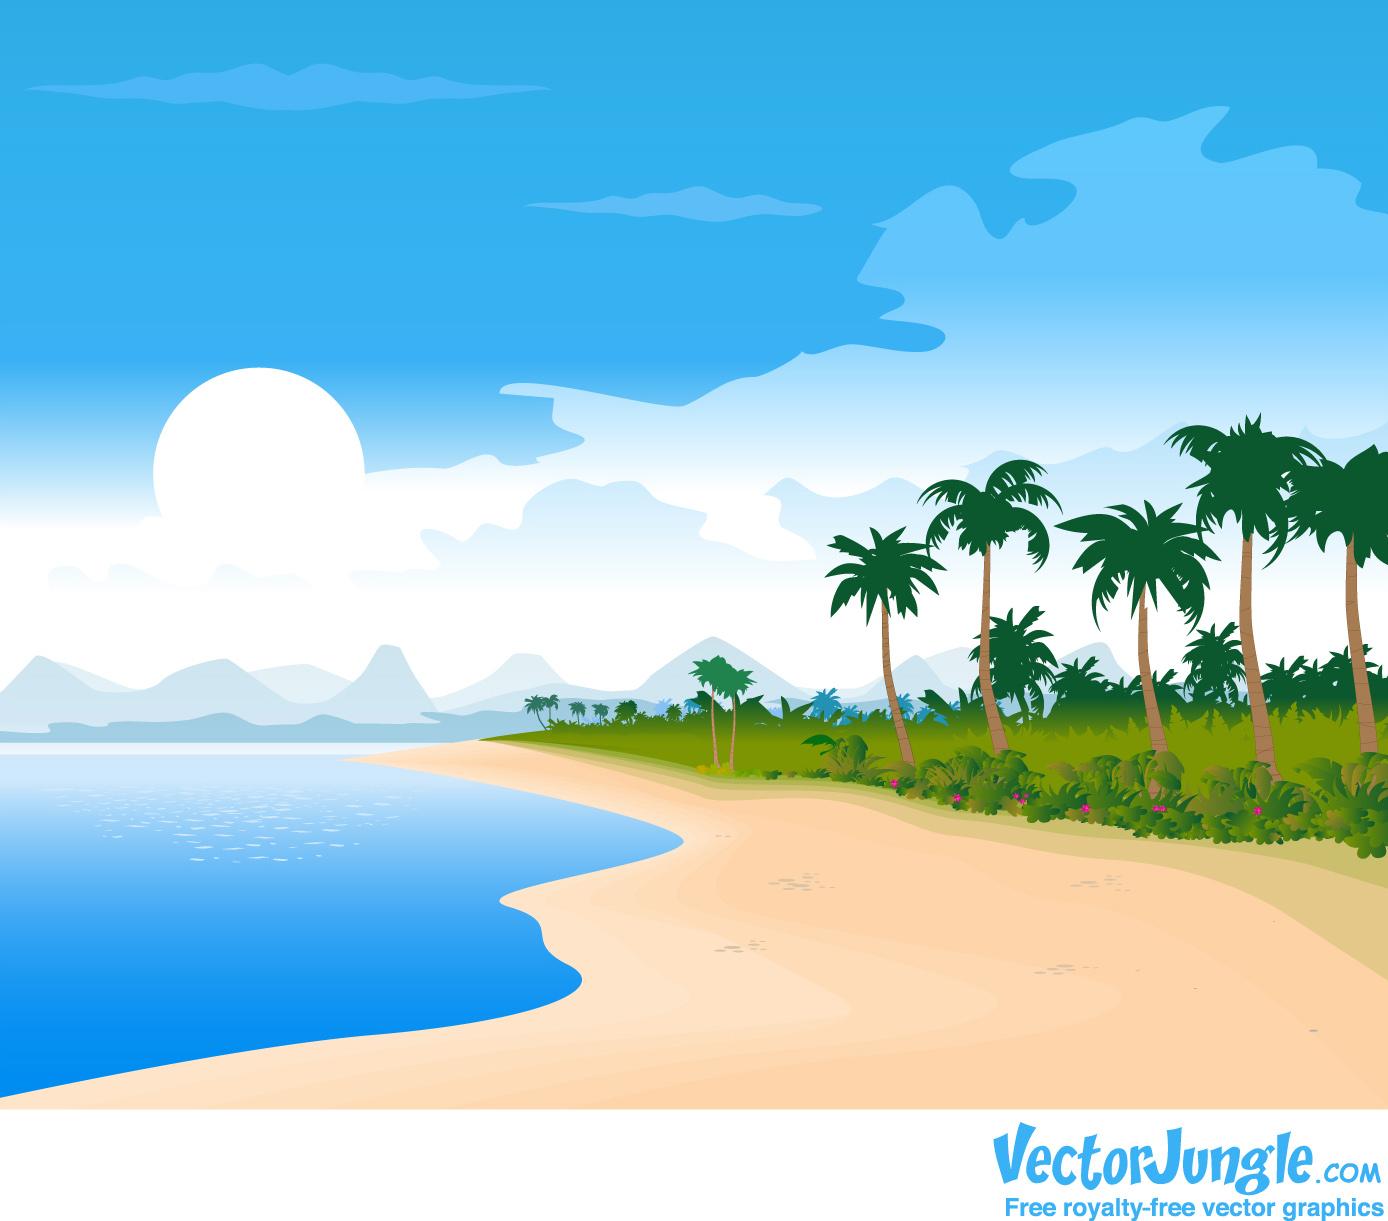 Resort clipart beach background VN9Z4v6zWUk Beach VN9Z4v6zWUk VN9Z4v6zWUk# Cartoon